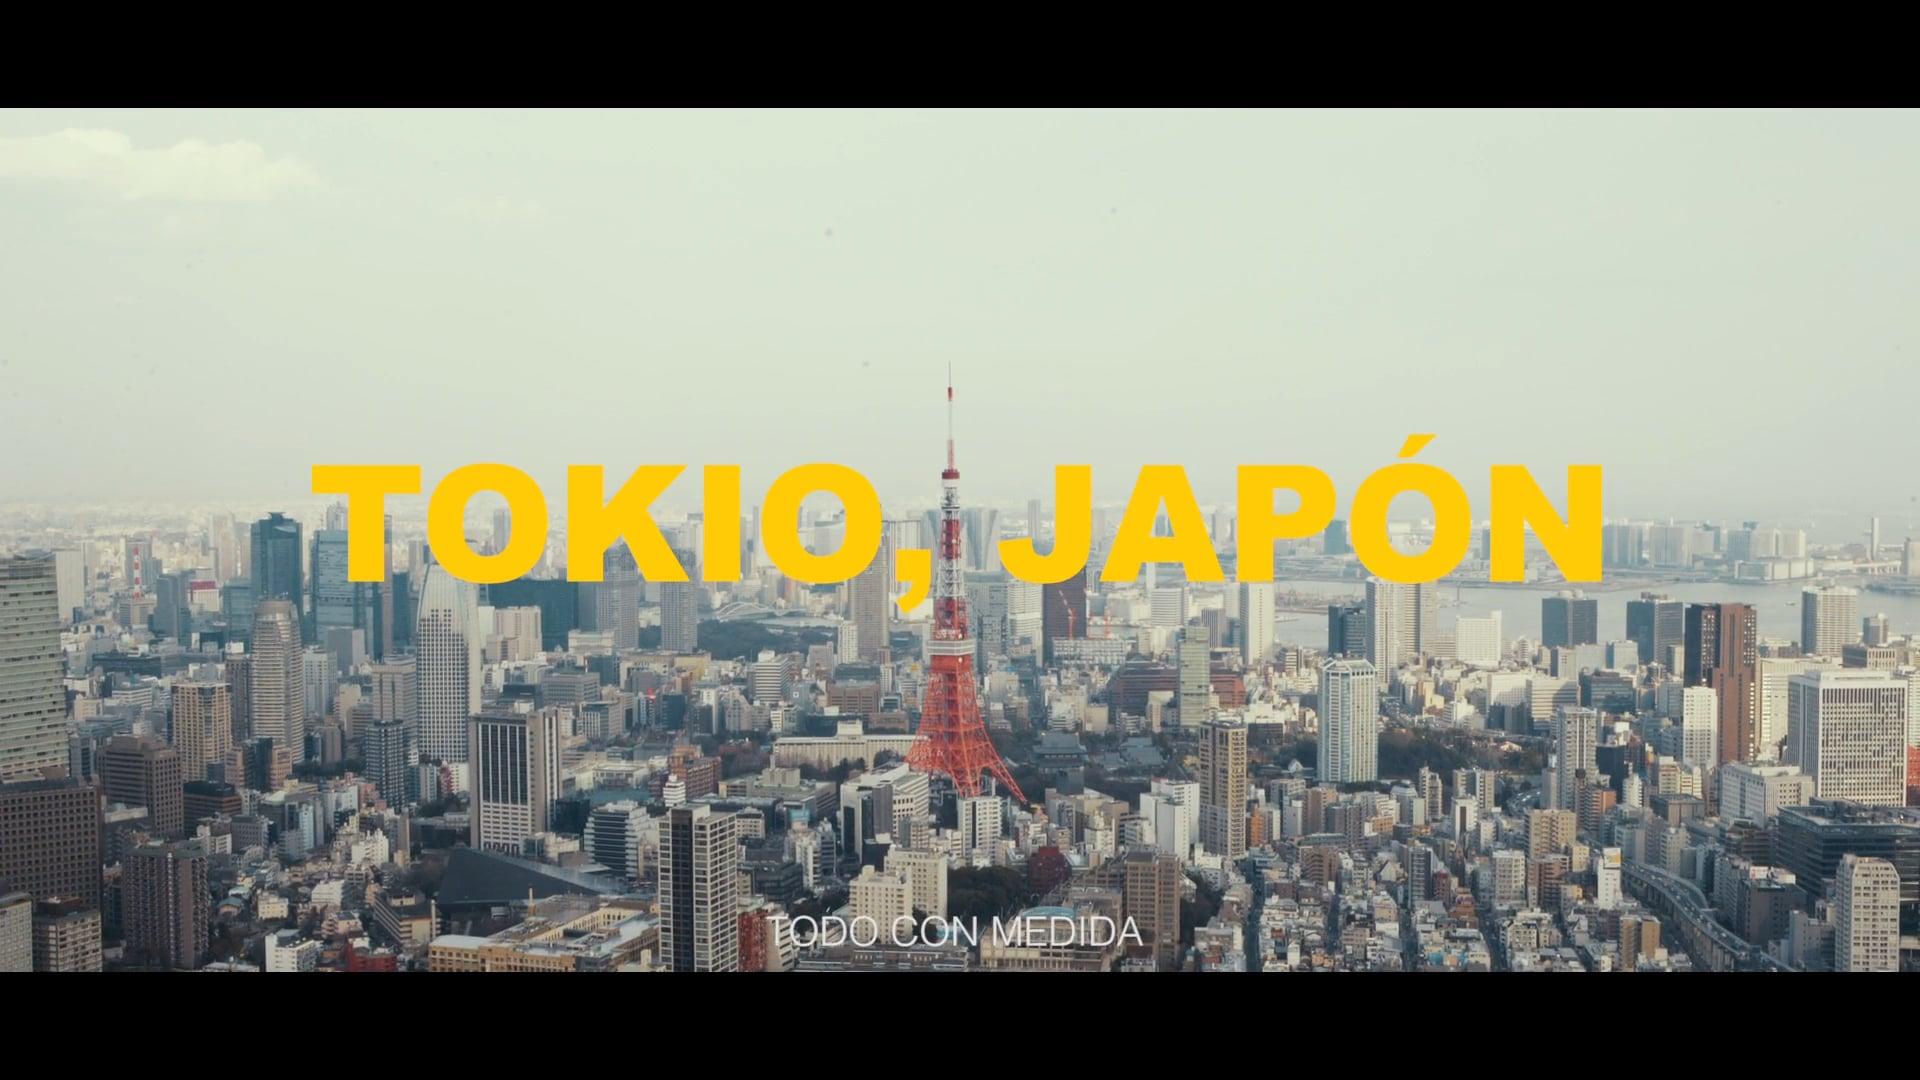 Corona - Tokio